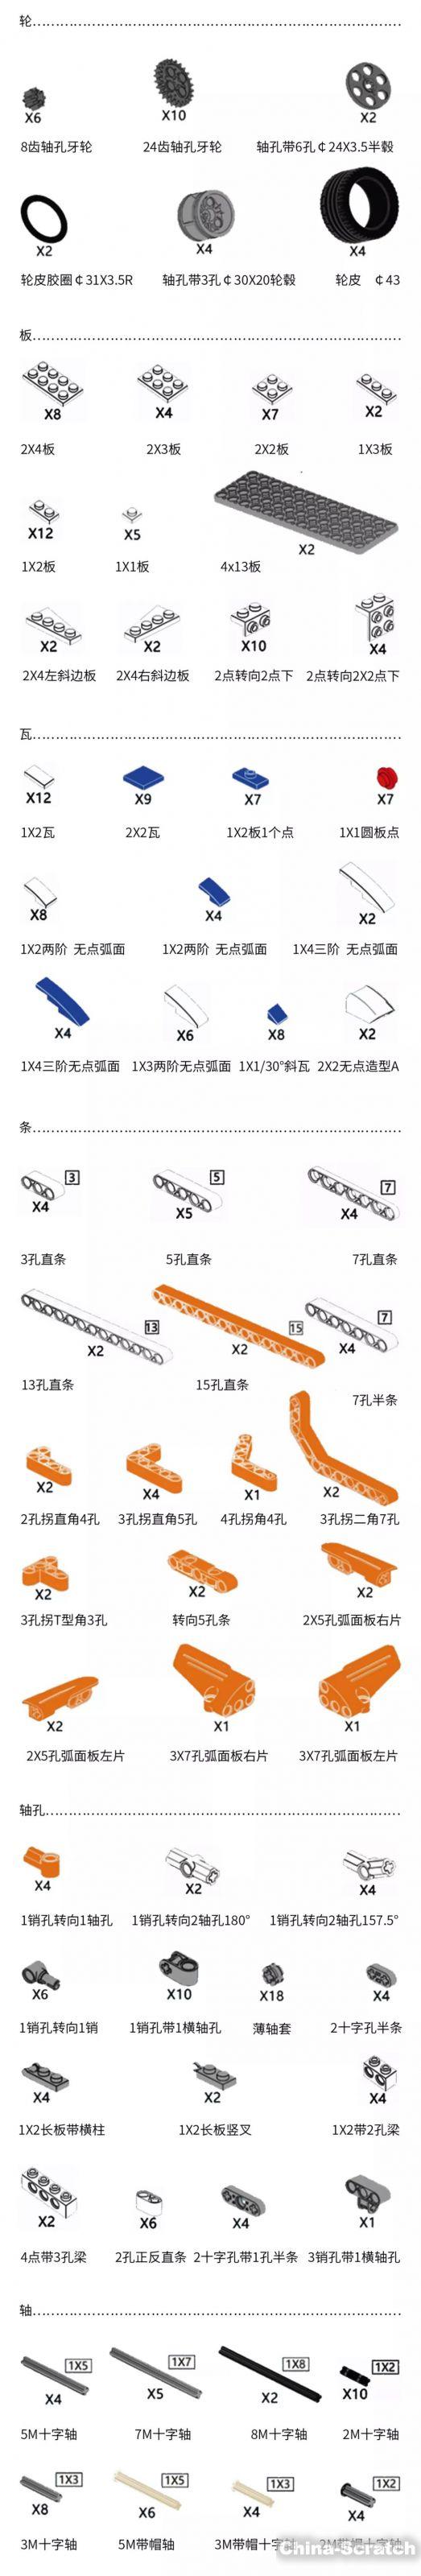 https://www.china-scratch.com/Uploads/timg/190514/11134Q400-32.jpg